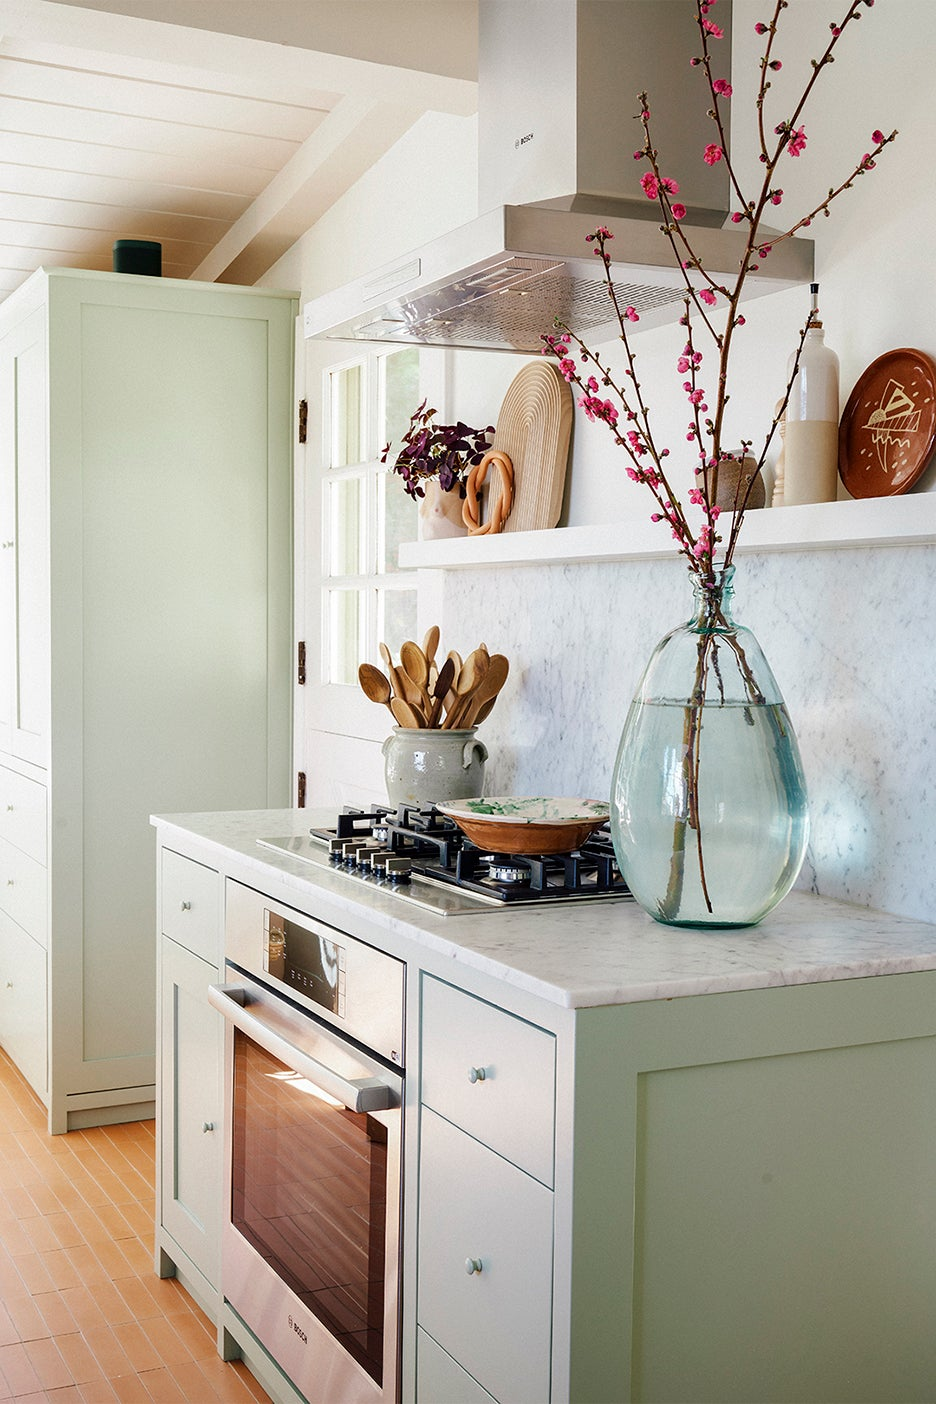 sage greenn cabinet with range